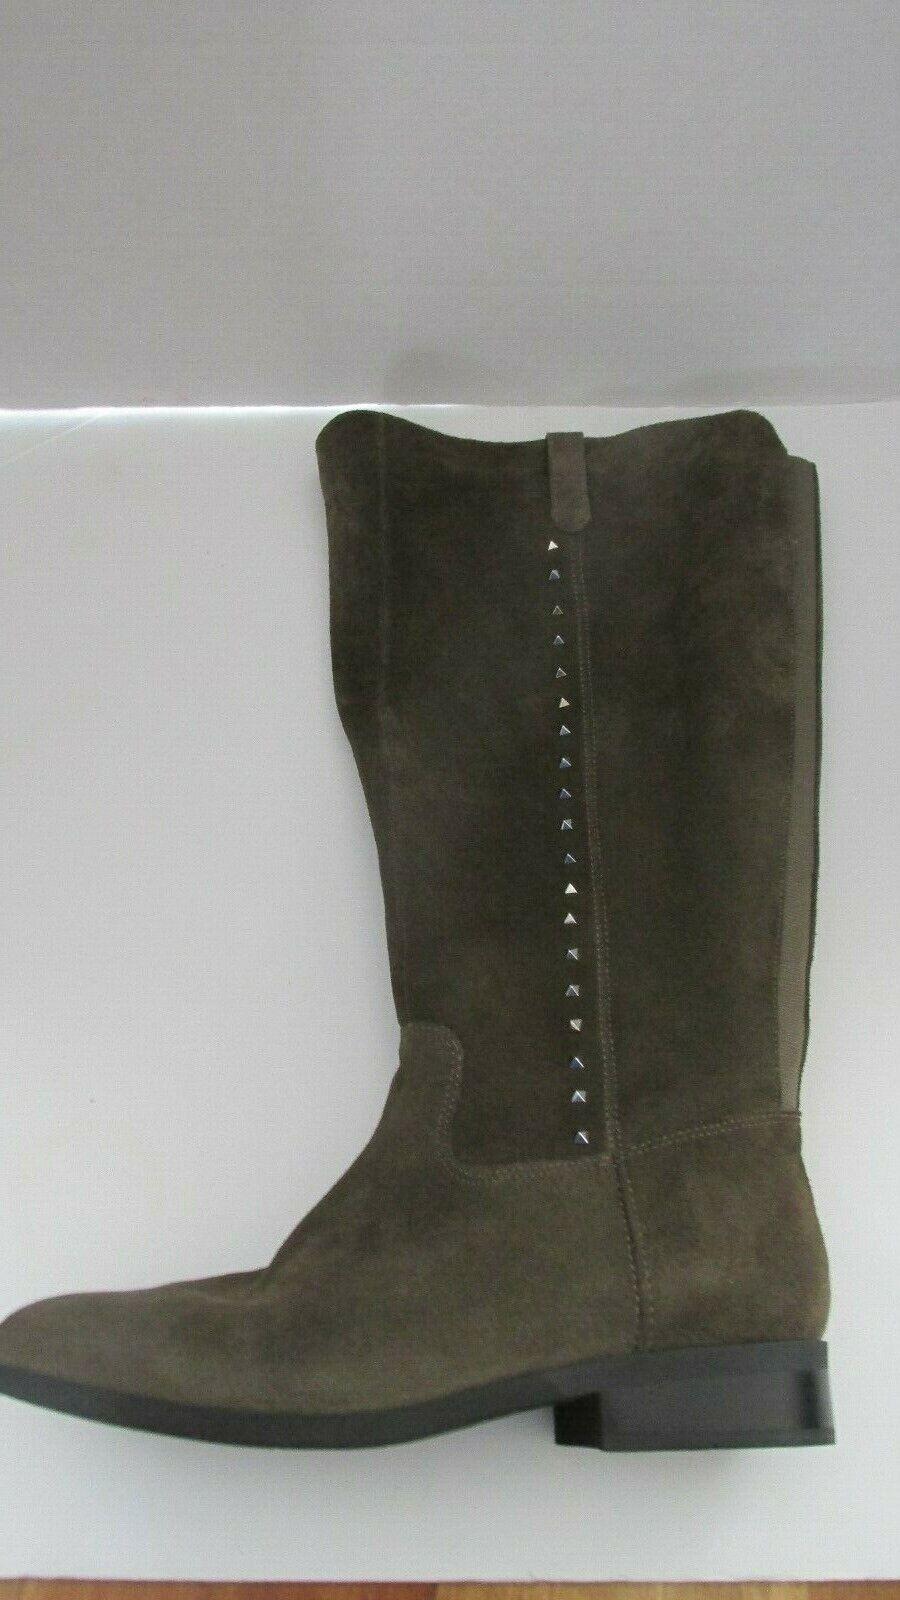 Marc Fisher ancho de piel de becerro Eje de Alto botas Secrit gris Topo Gamuza 8.5 de ancho